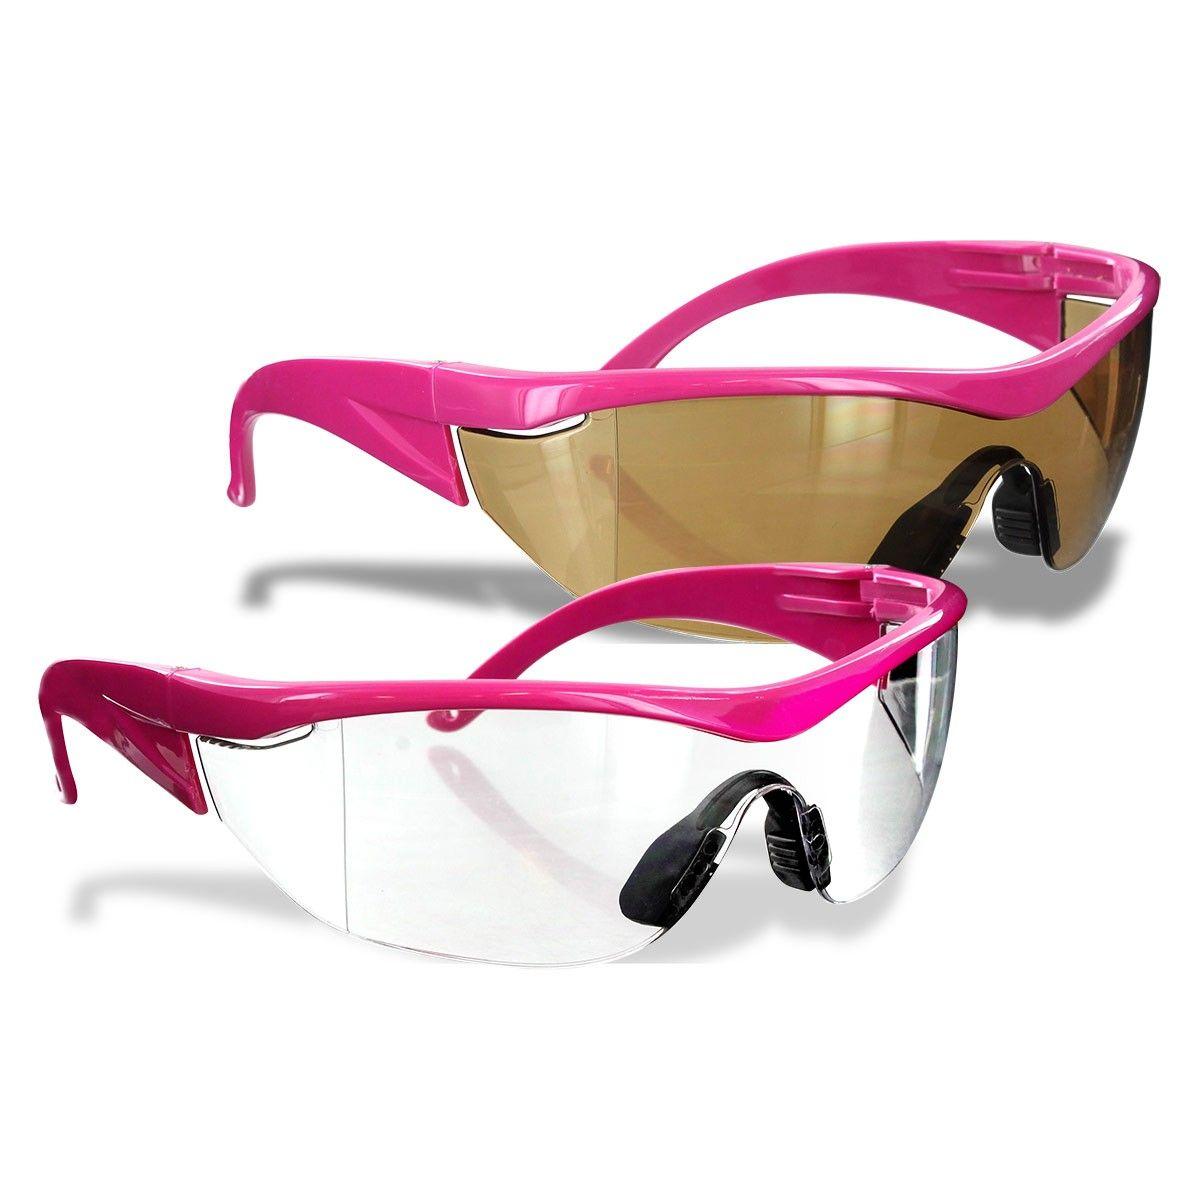 34c3f58c503b Healthmate Protective Eyewear - Safety Glasses | Dental Hygiene | Eyewear,  Glasses y Eye protection